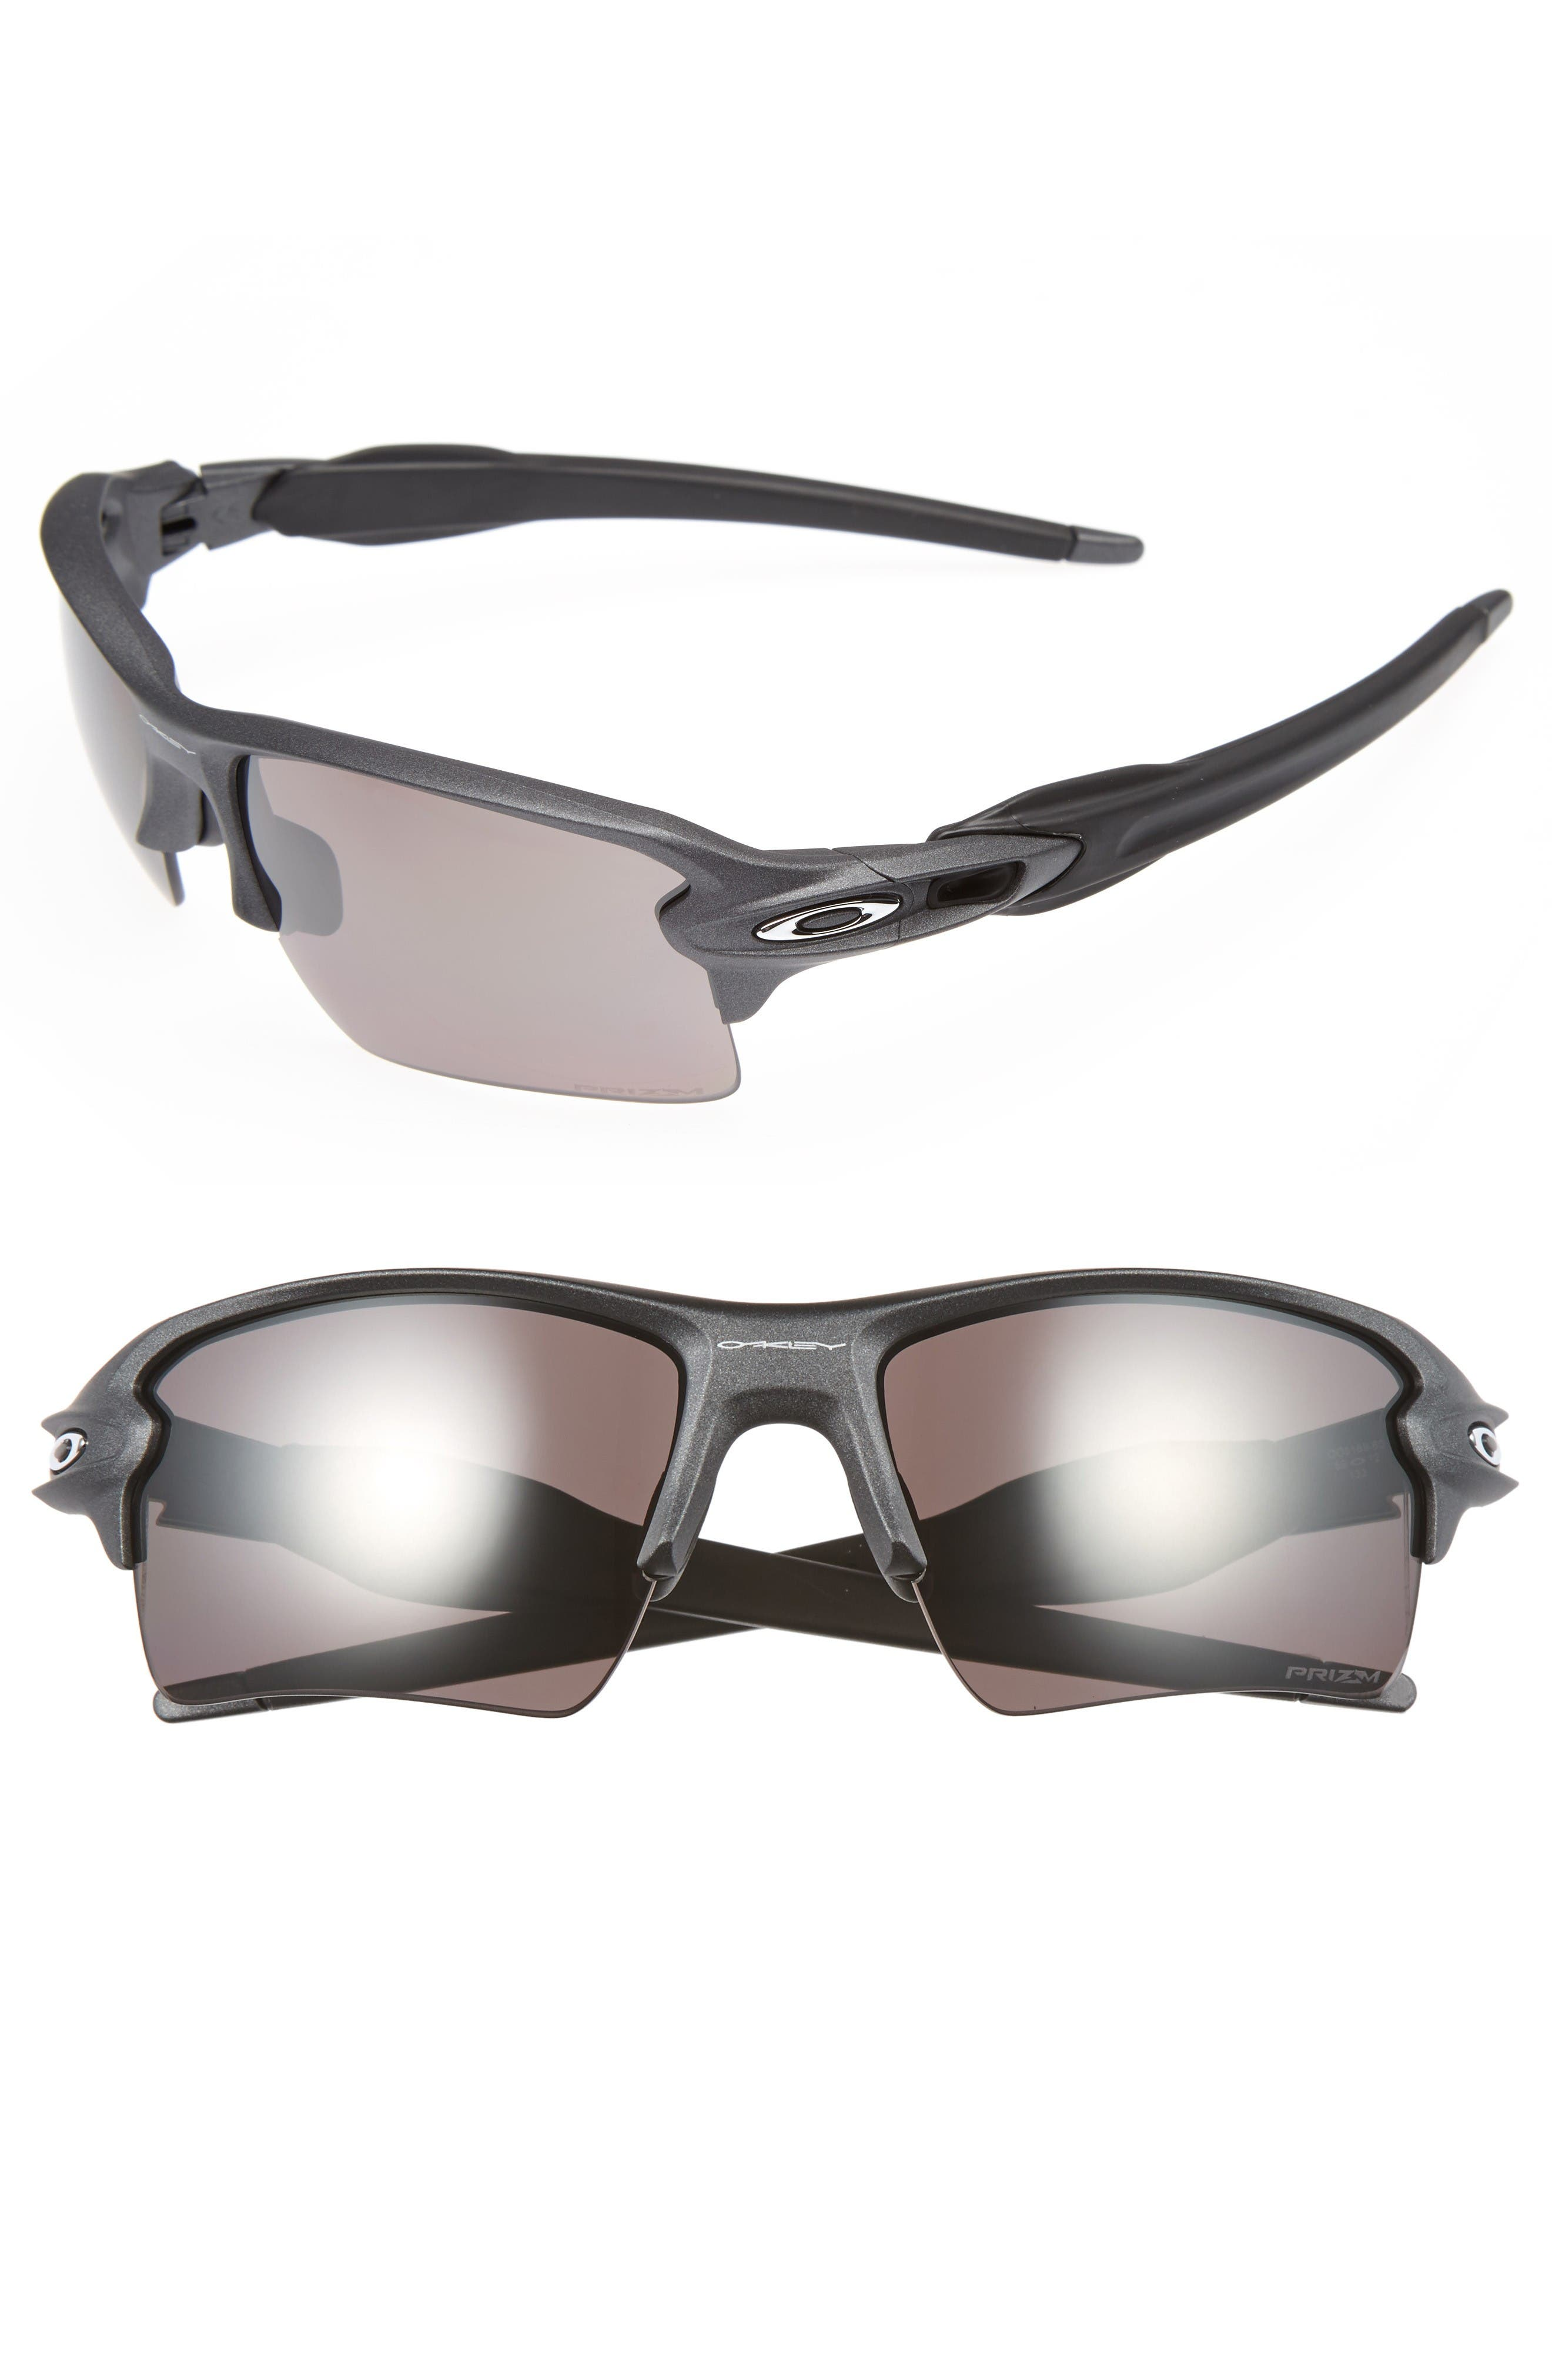 Flak 2.0 XL 59mm Polarized Sunglasses,                             Main thumbnail 1, color,                             Grey